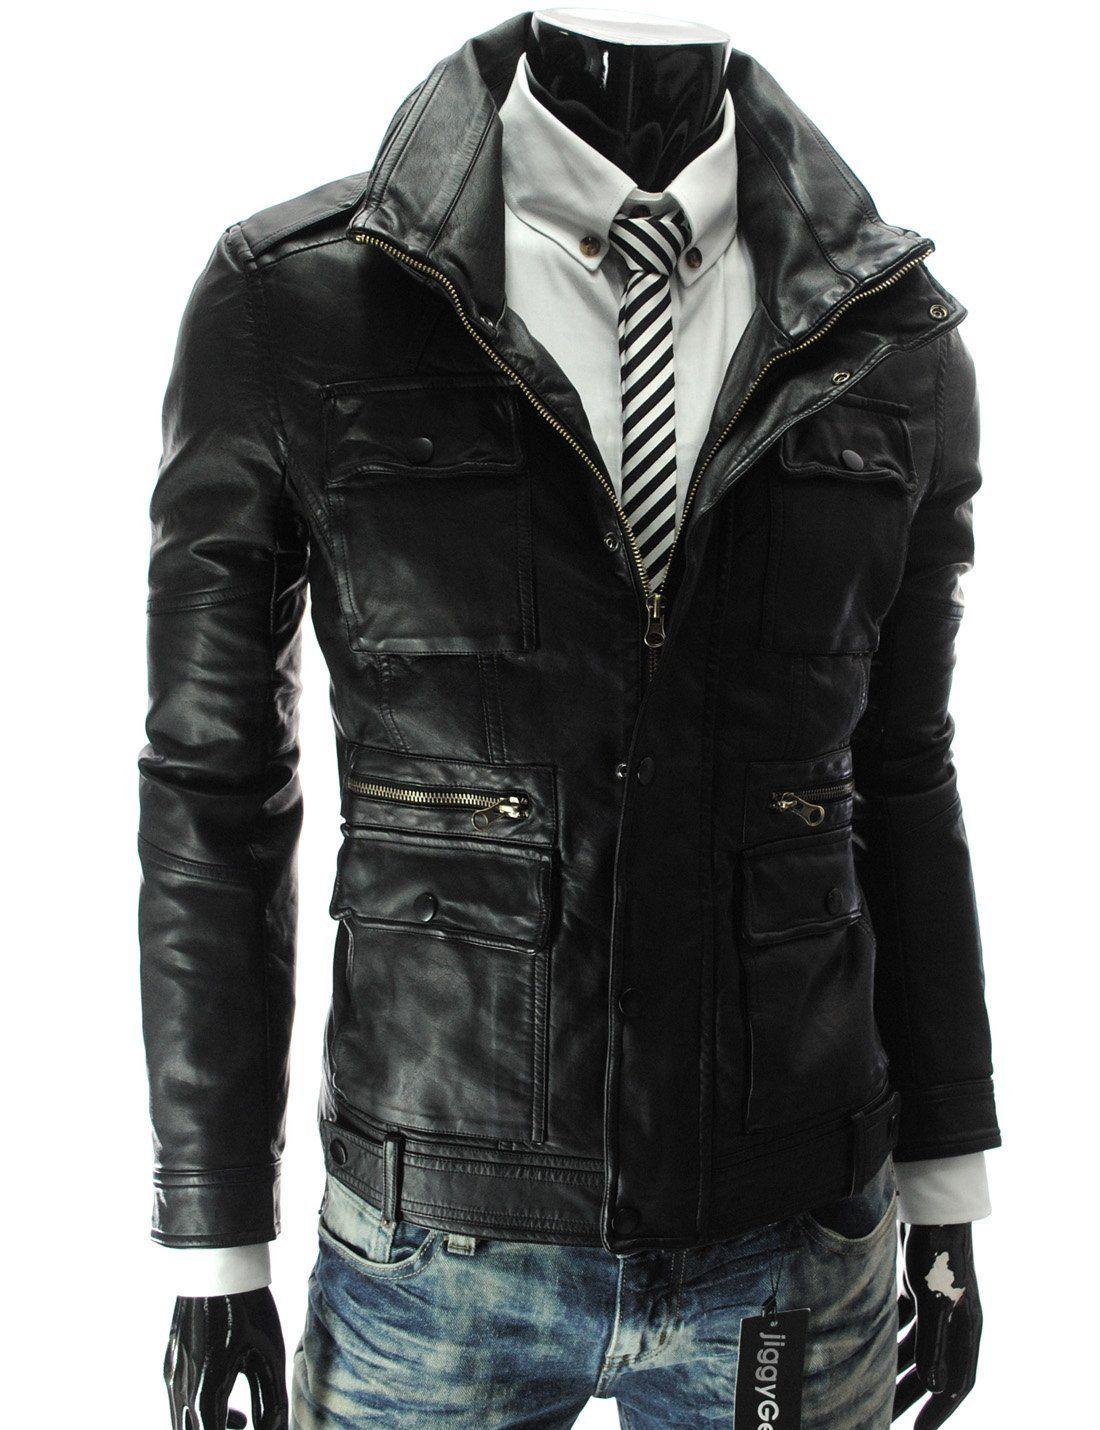 Handmade Custom New Men Front Stylish Pockets Medium Stylish Leather Jacket Leather Jacket Men Leather Jacket [ 1430 x 1100 Pixel ]